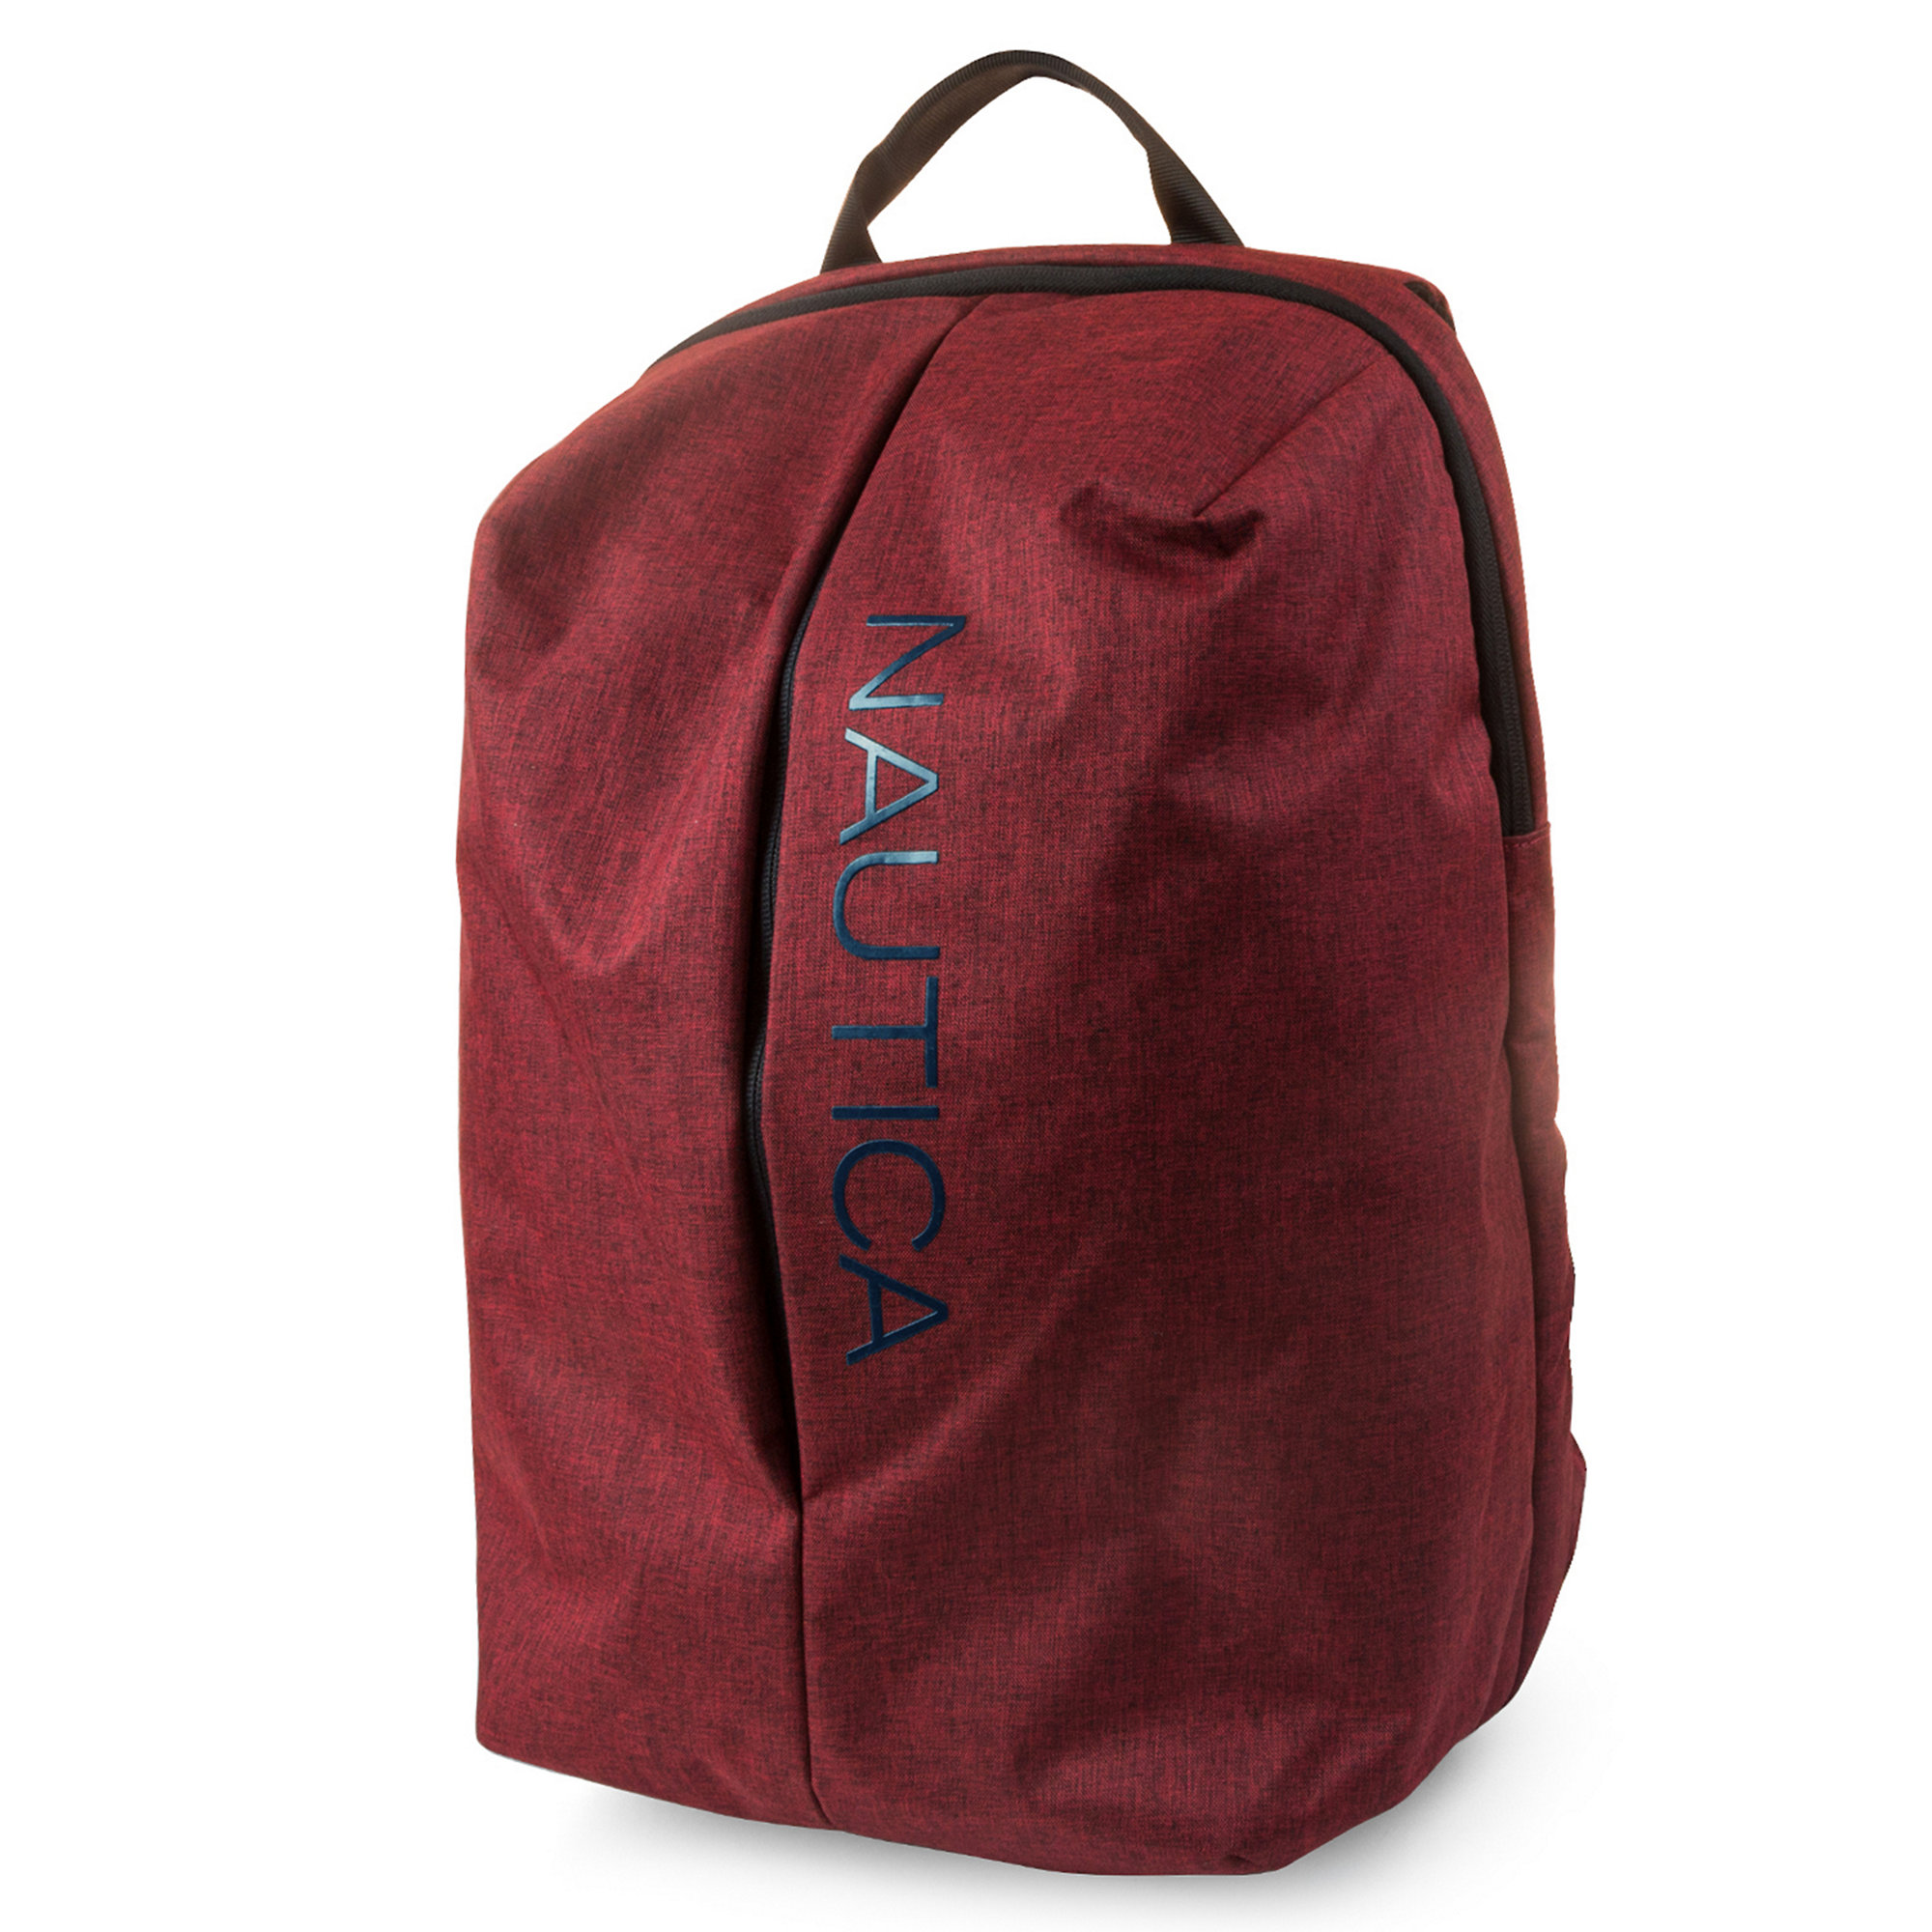 2000x2000 Bags Amp Backpacks